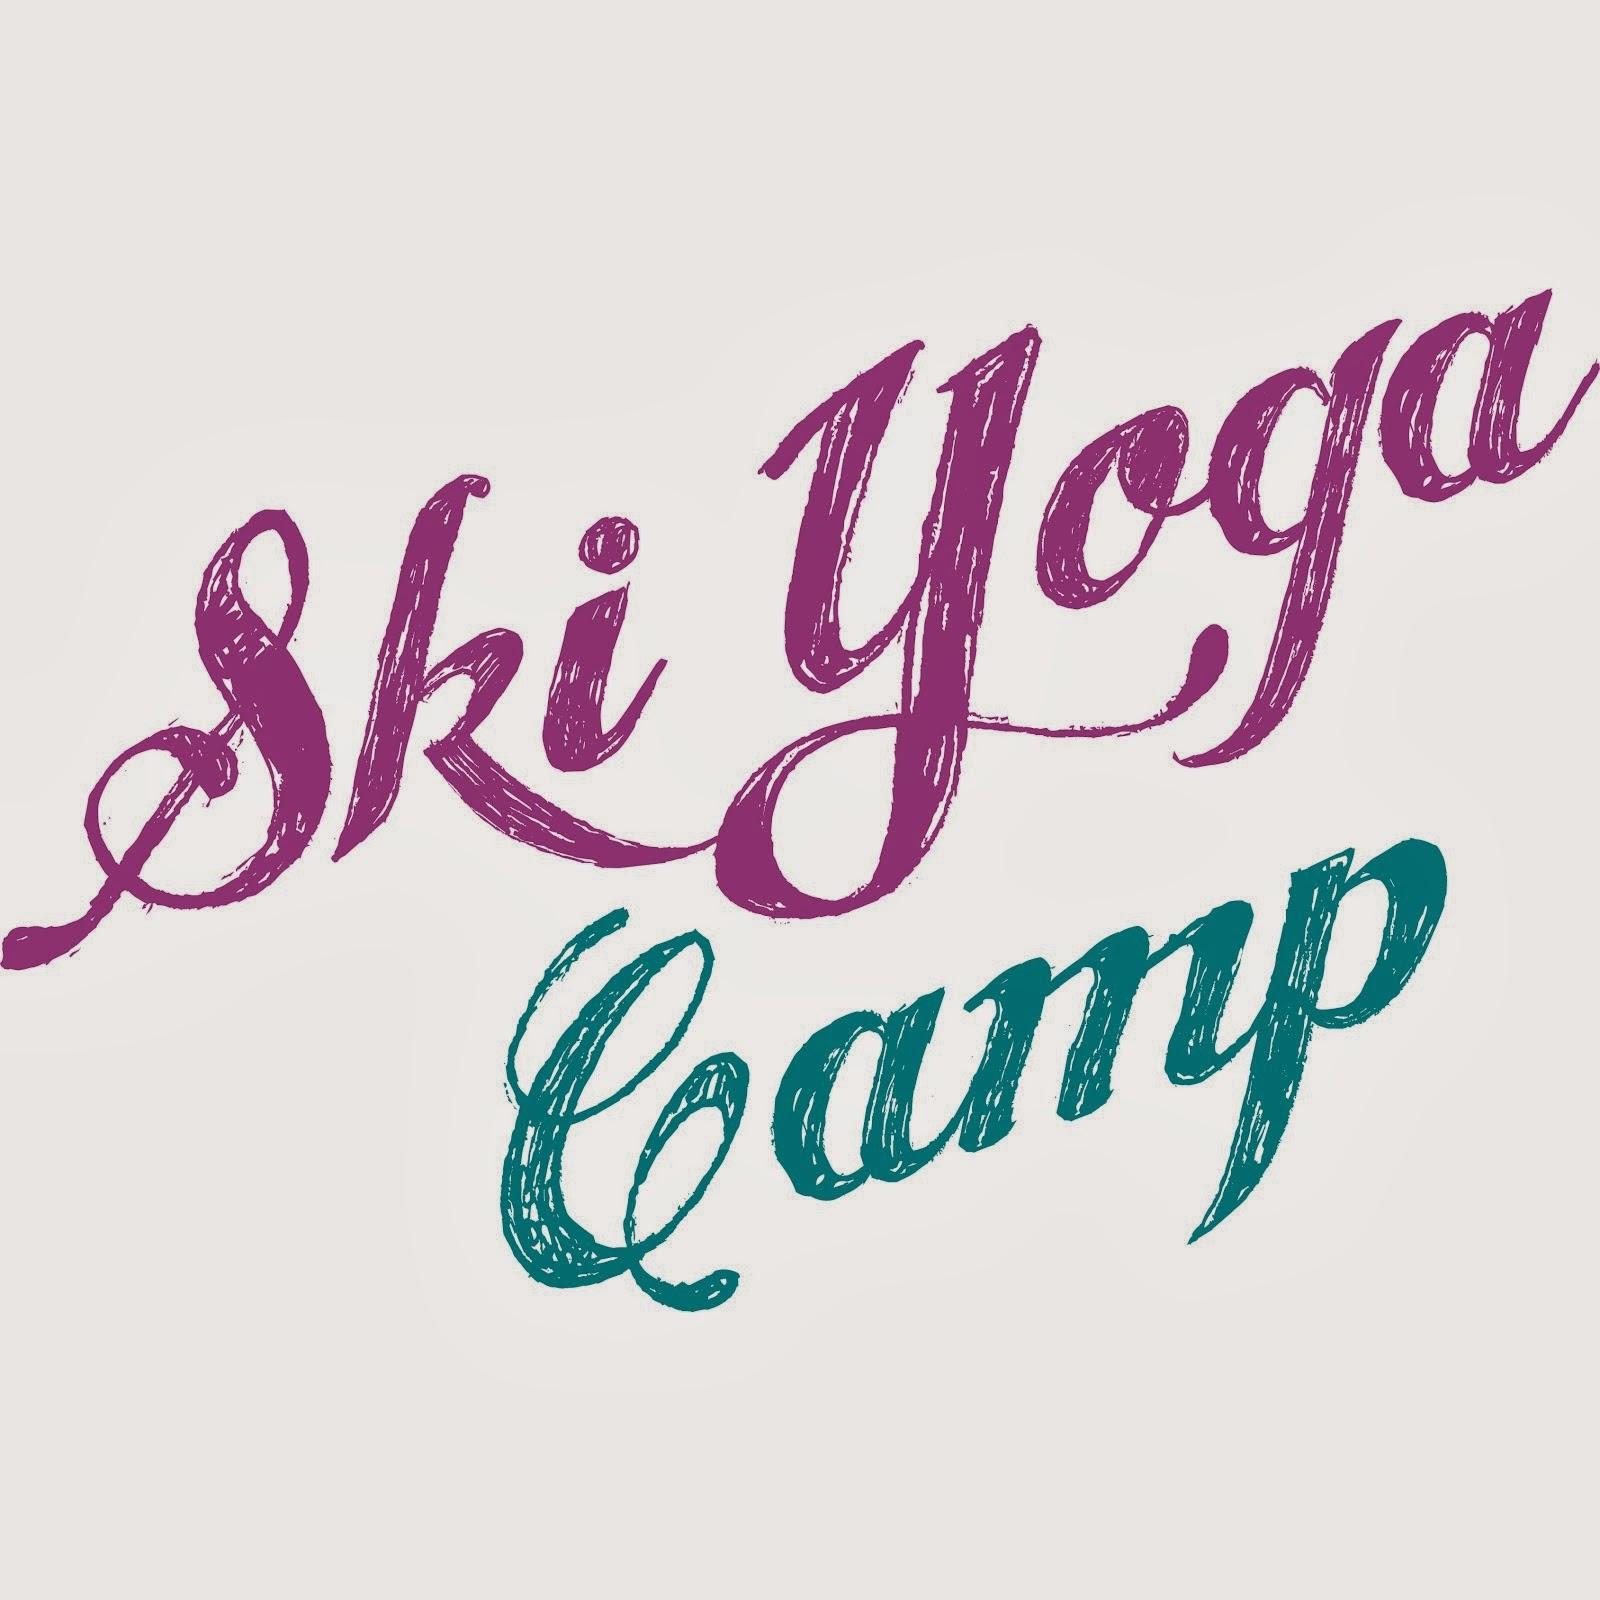 SkiYogaCamp 2015